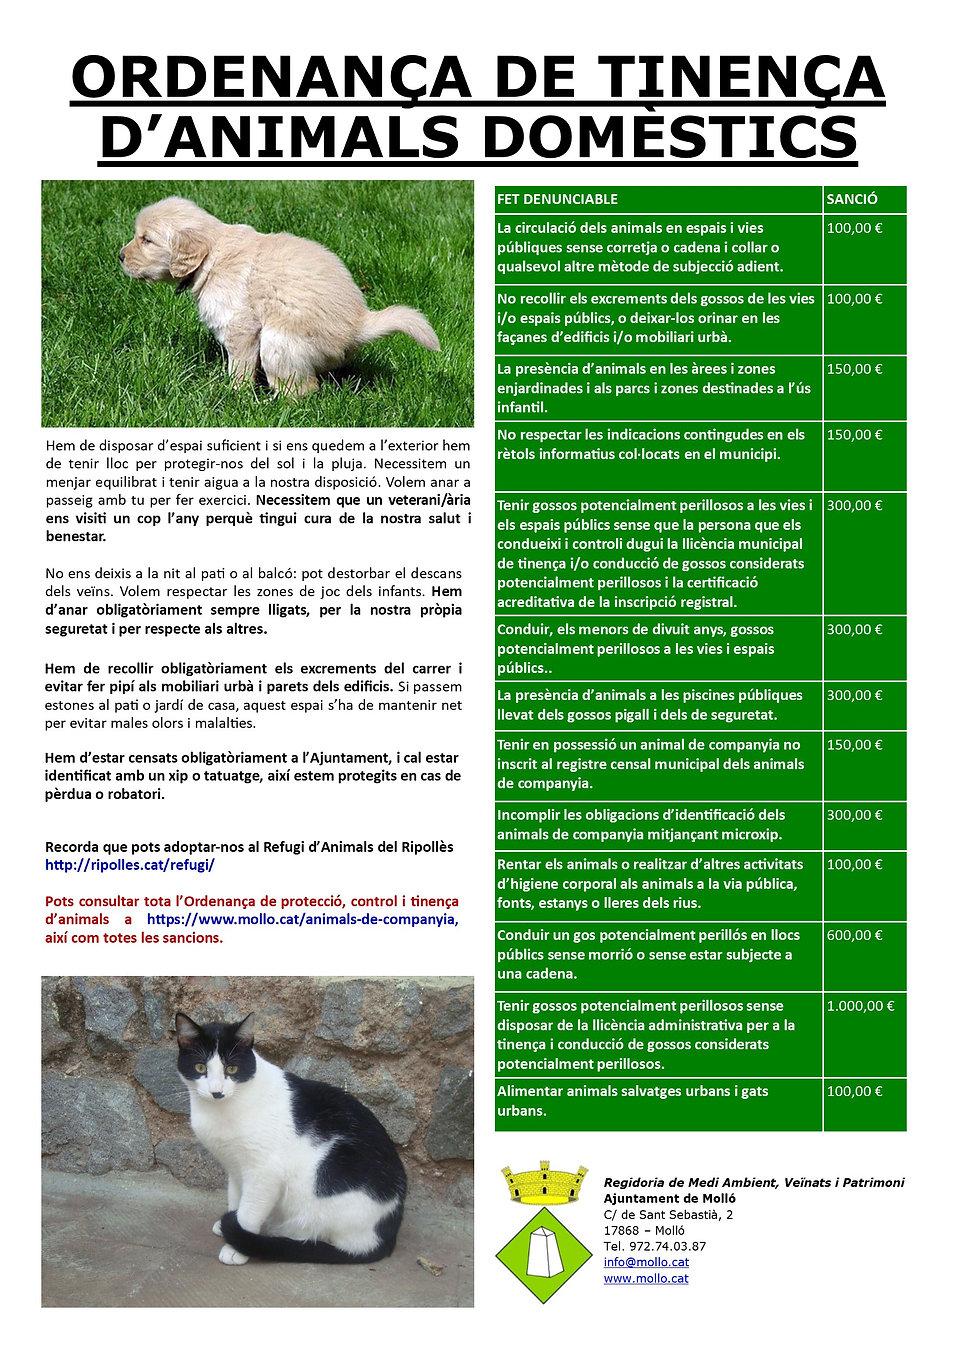 ANIMALS DE COMPANYIA V2.jpg